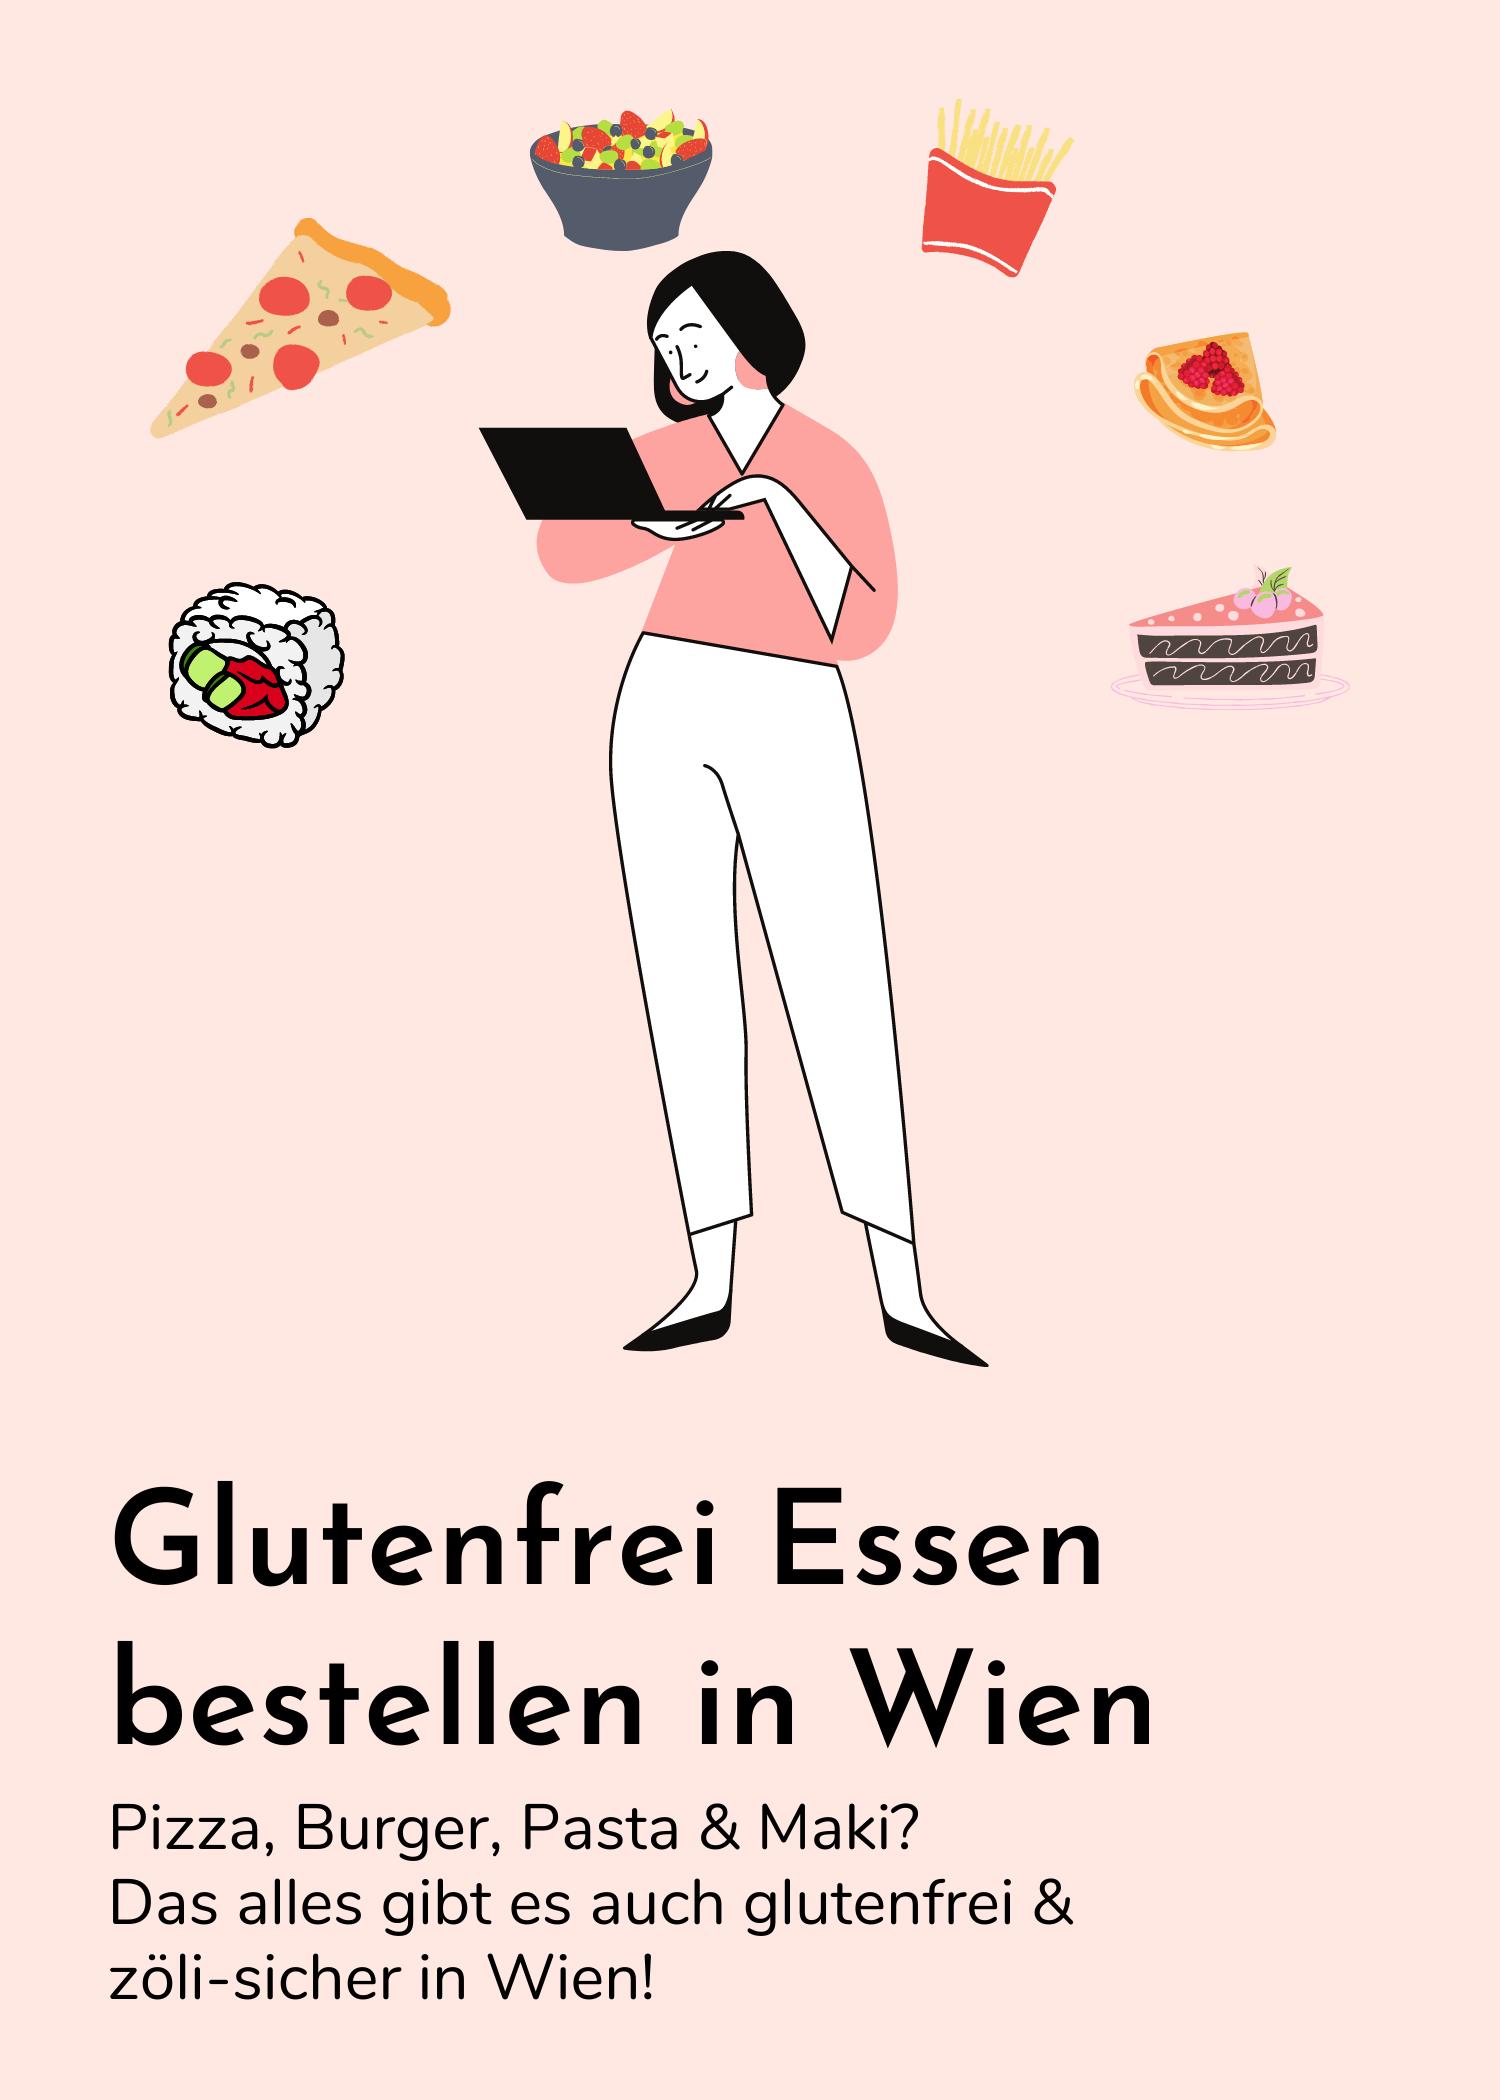 Glutenfrei Essen bestellen in Wien – Diese Lokale liefern.